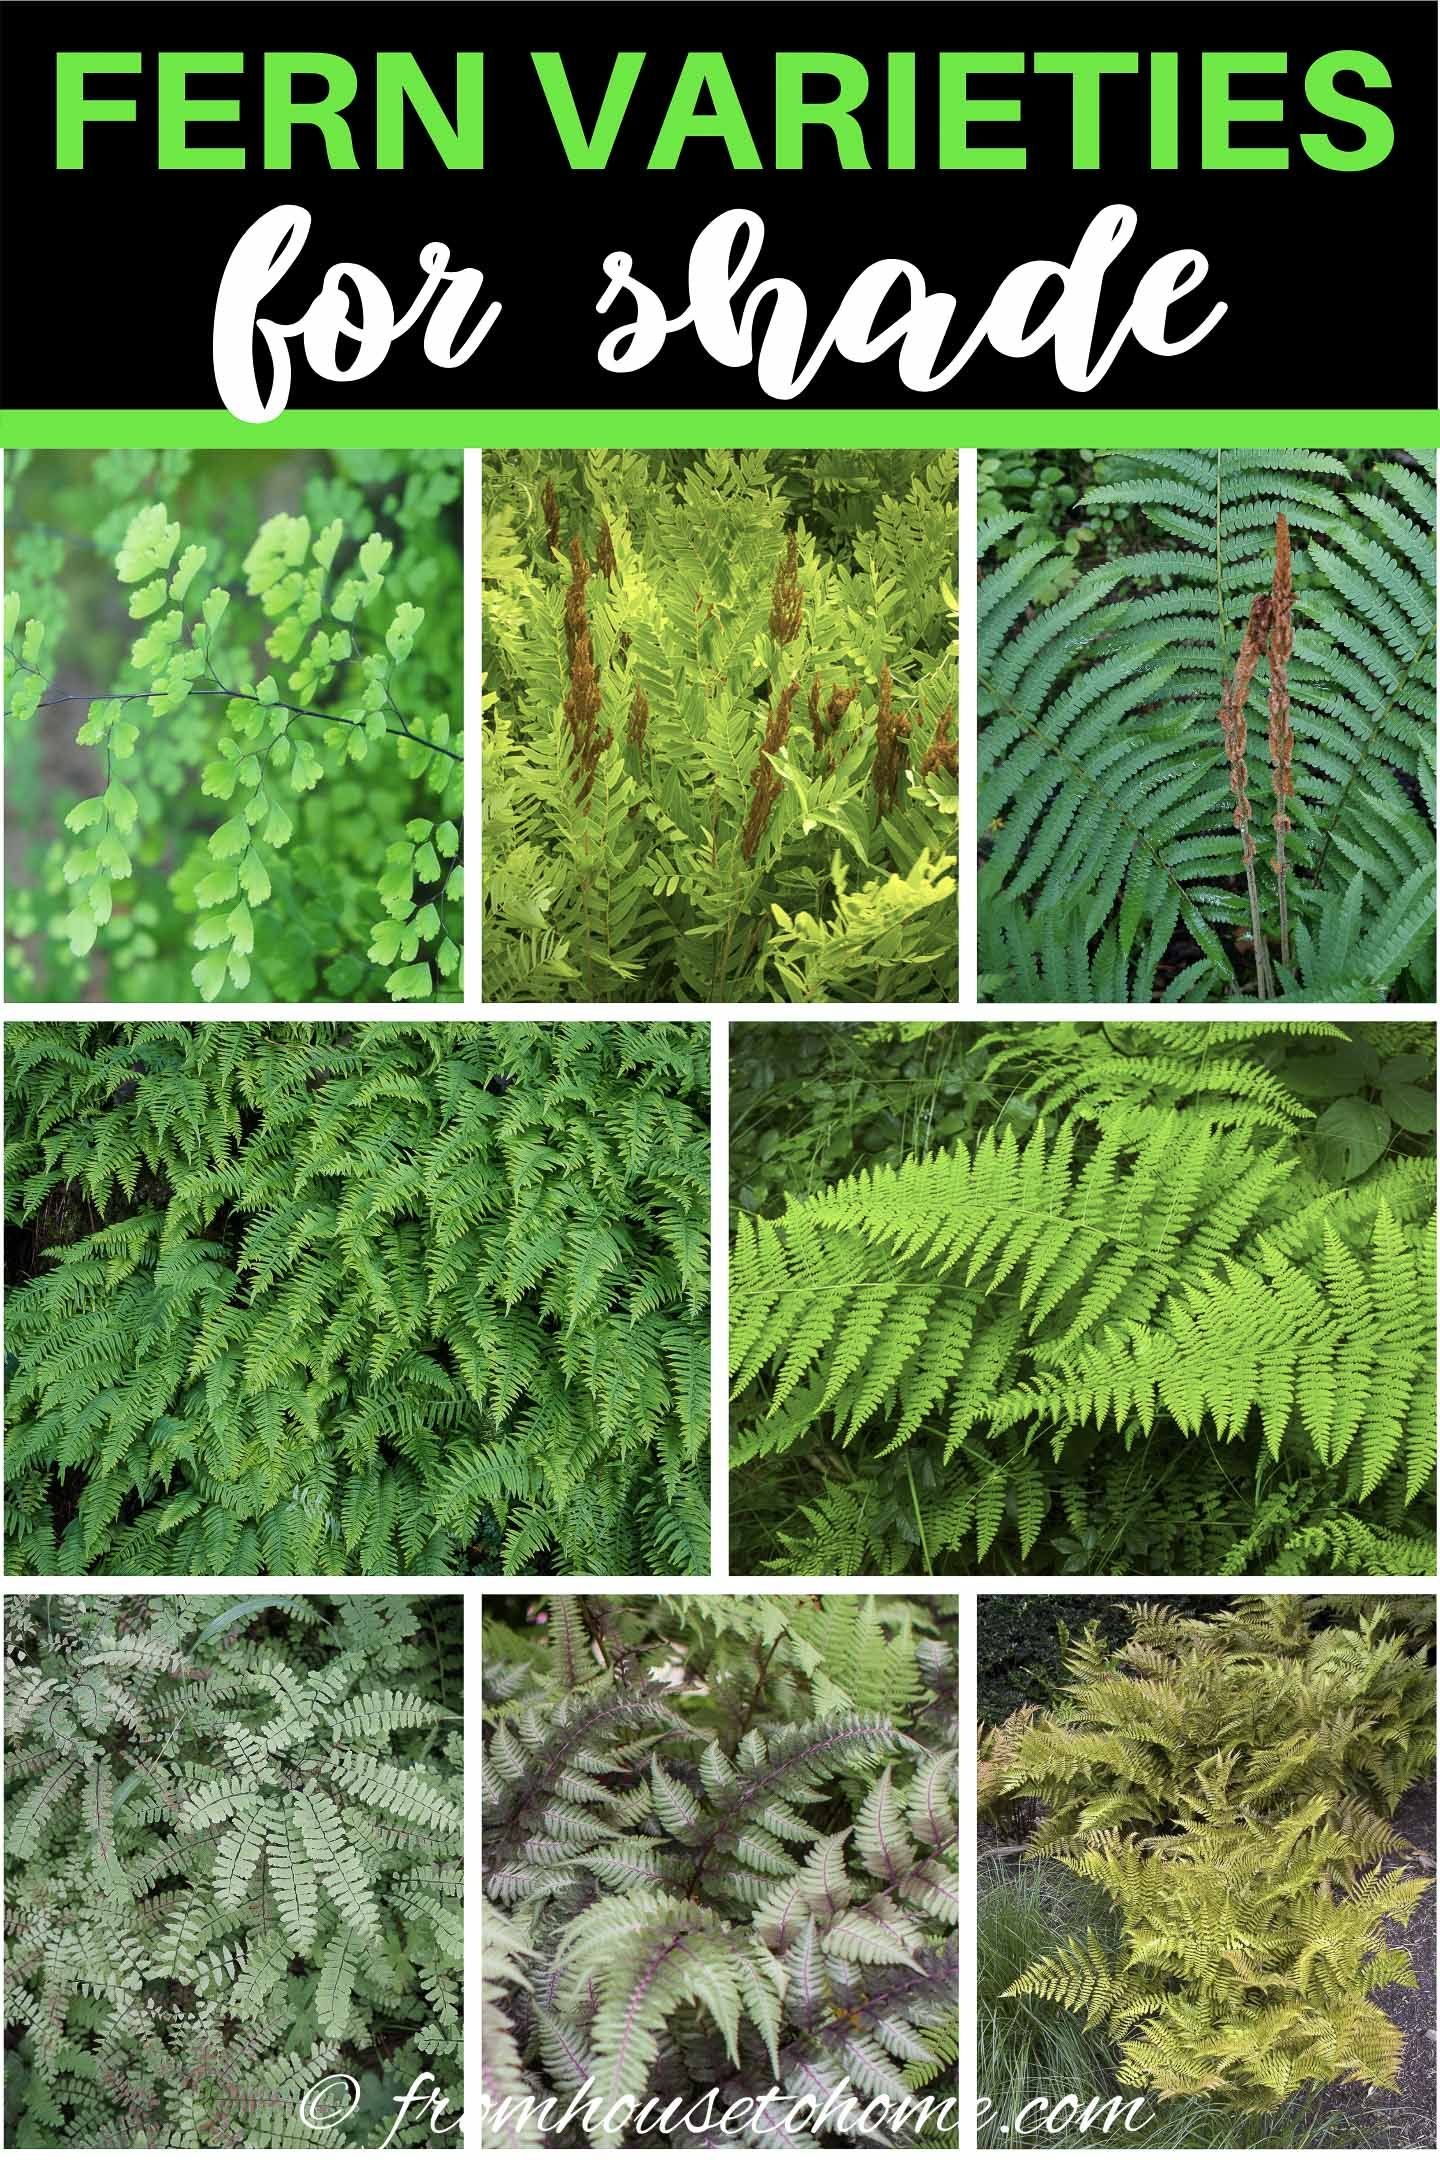 20 Winter Hardy Fern Varieties In 2020 Shade Garden Plants Evergreen Ferns Shade Plants